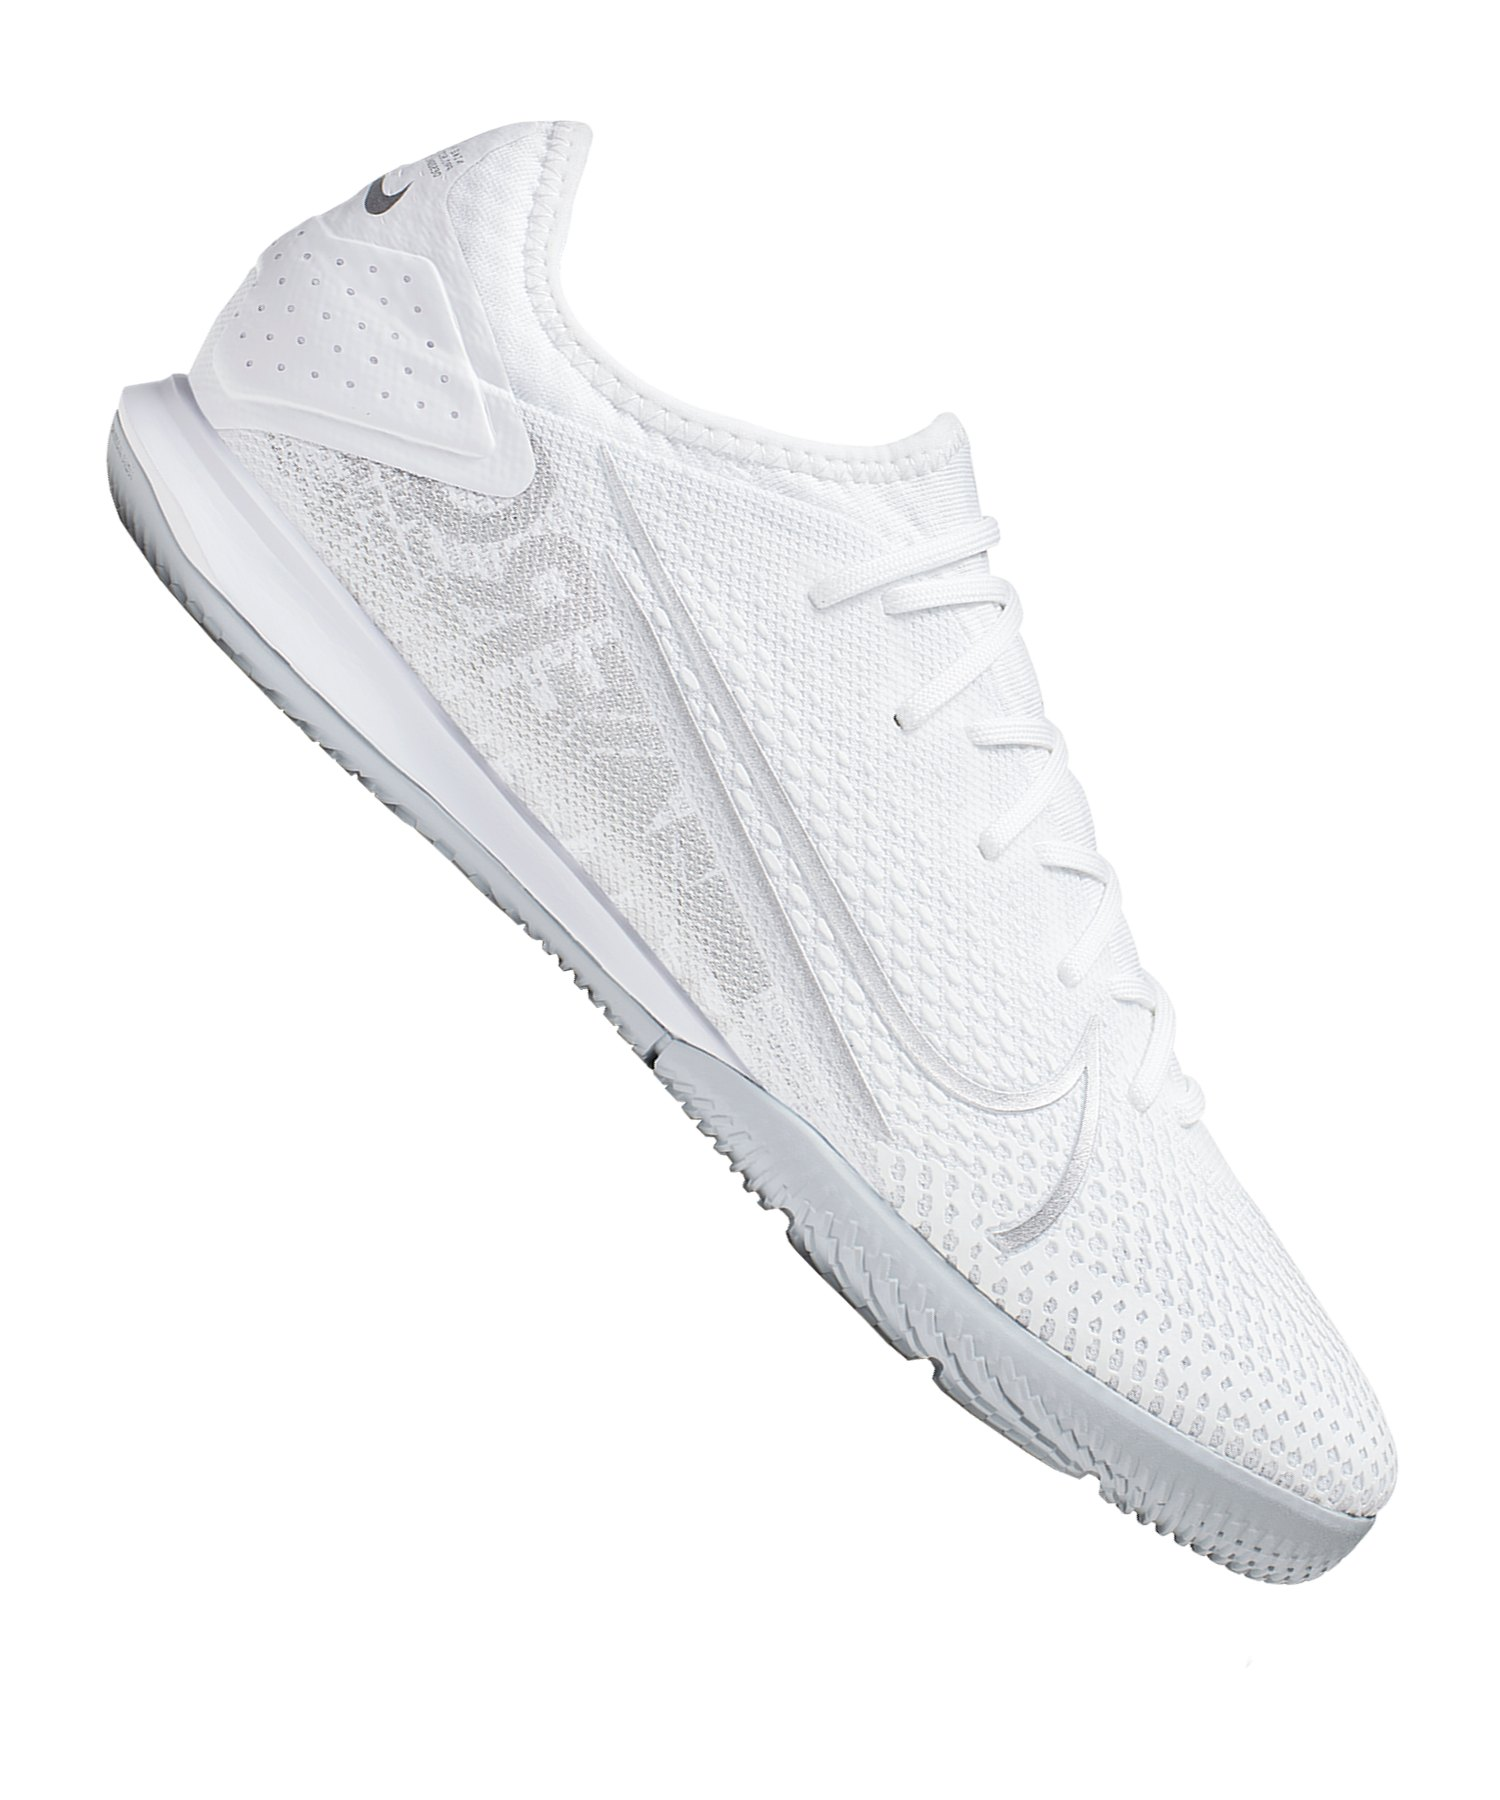 Nike Mercurial Vapor XIII Pro IC F100 - weiss